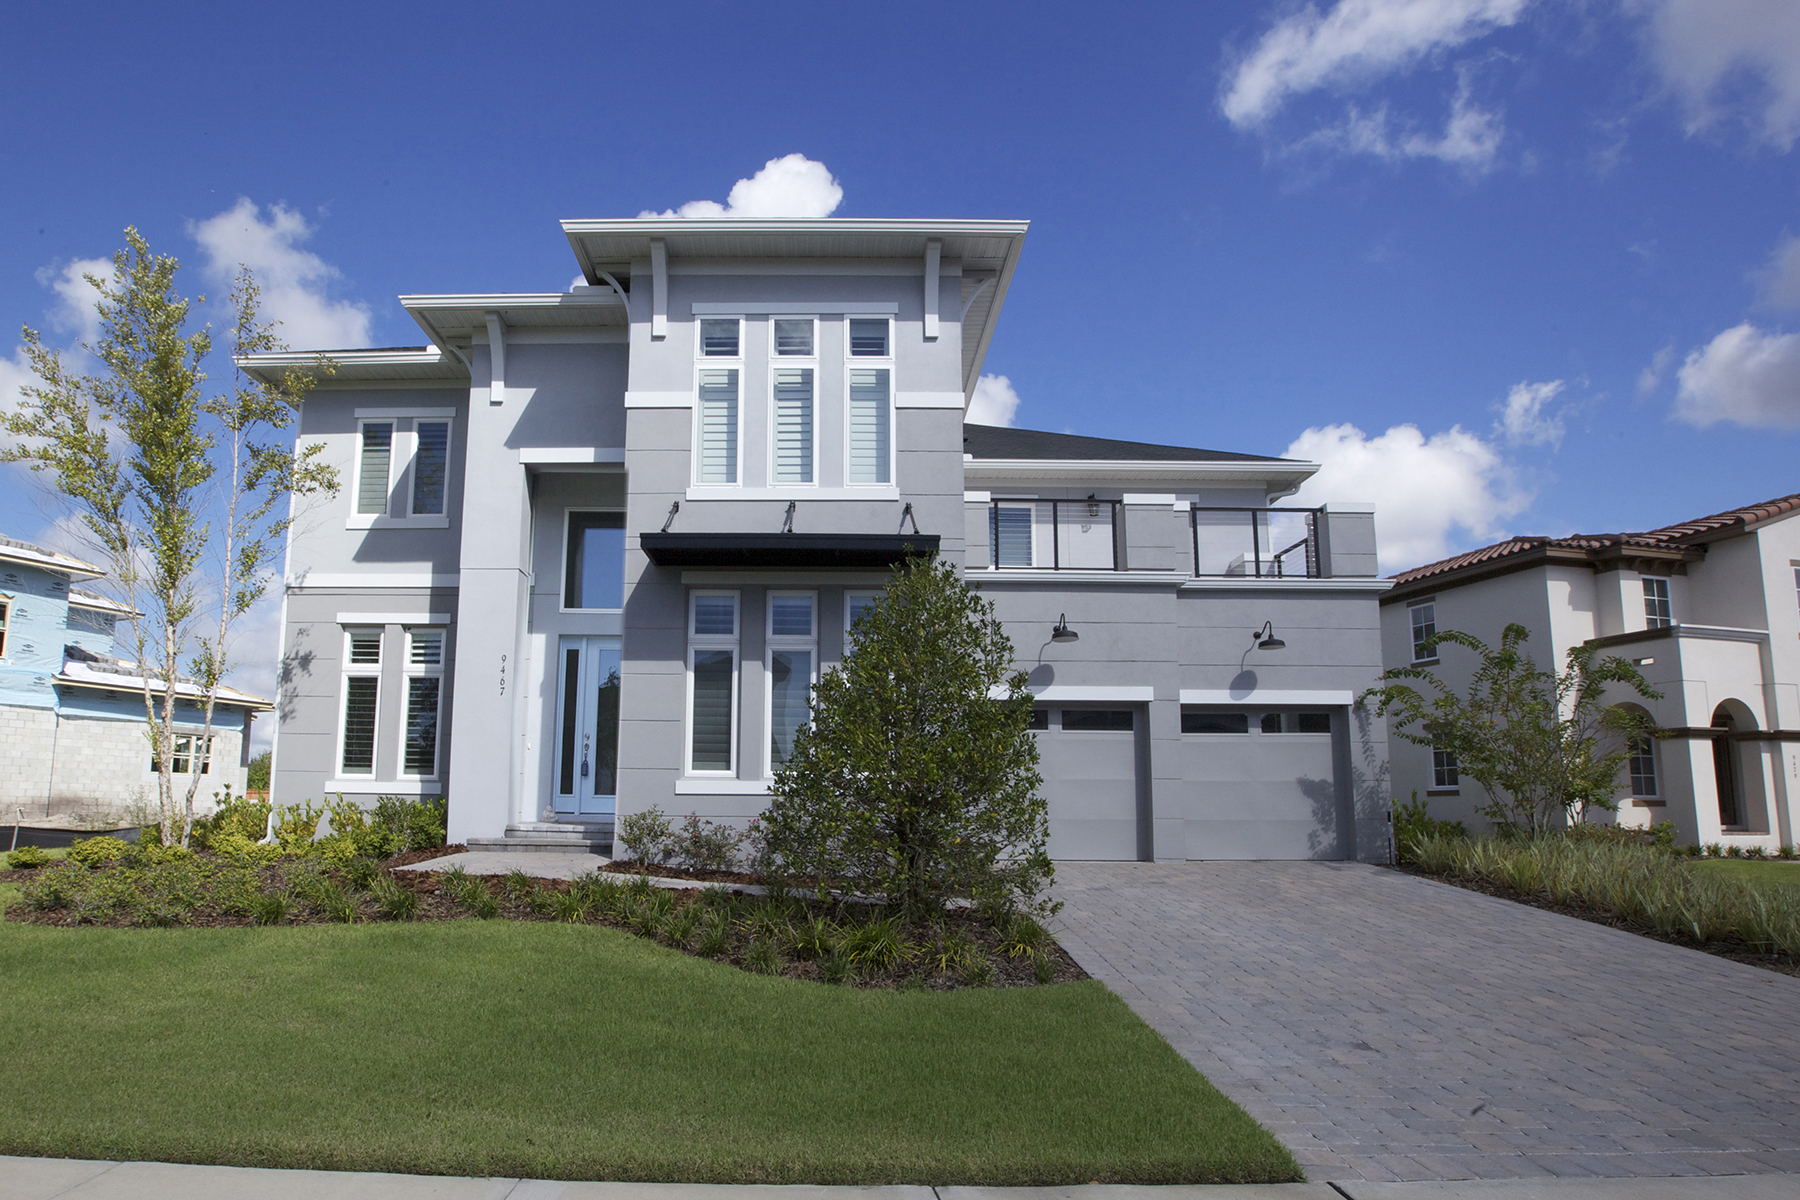 Single Family Home for Sale at 9467 Becker Ct , Orlando, FL 32827 9467 Becker Ct Orlando, Florida, 32827 United States